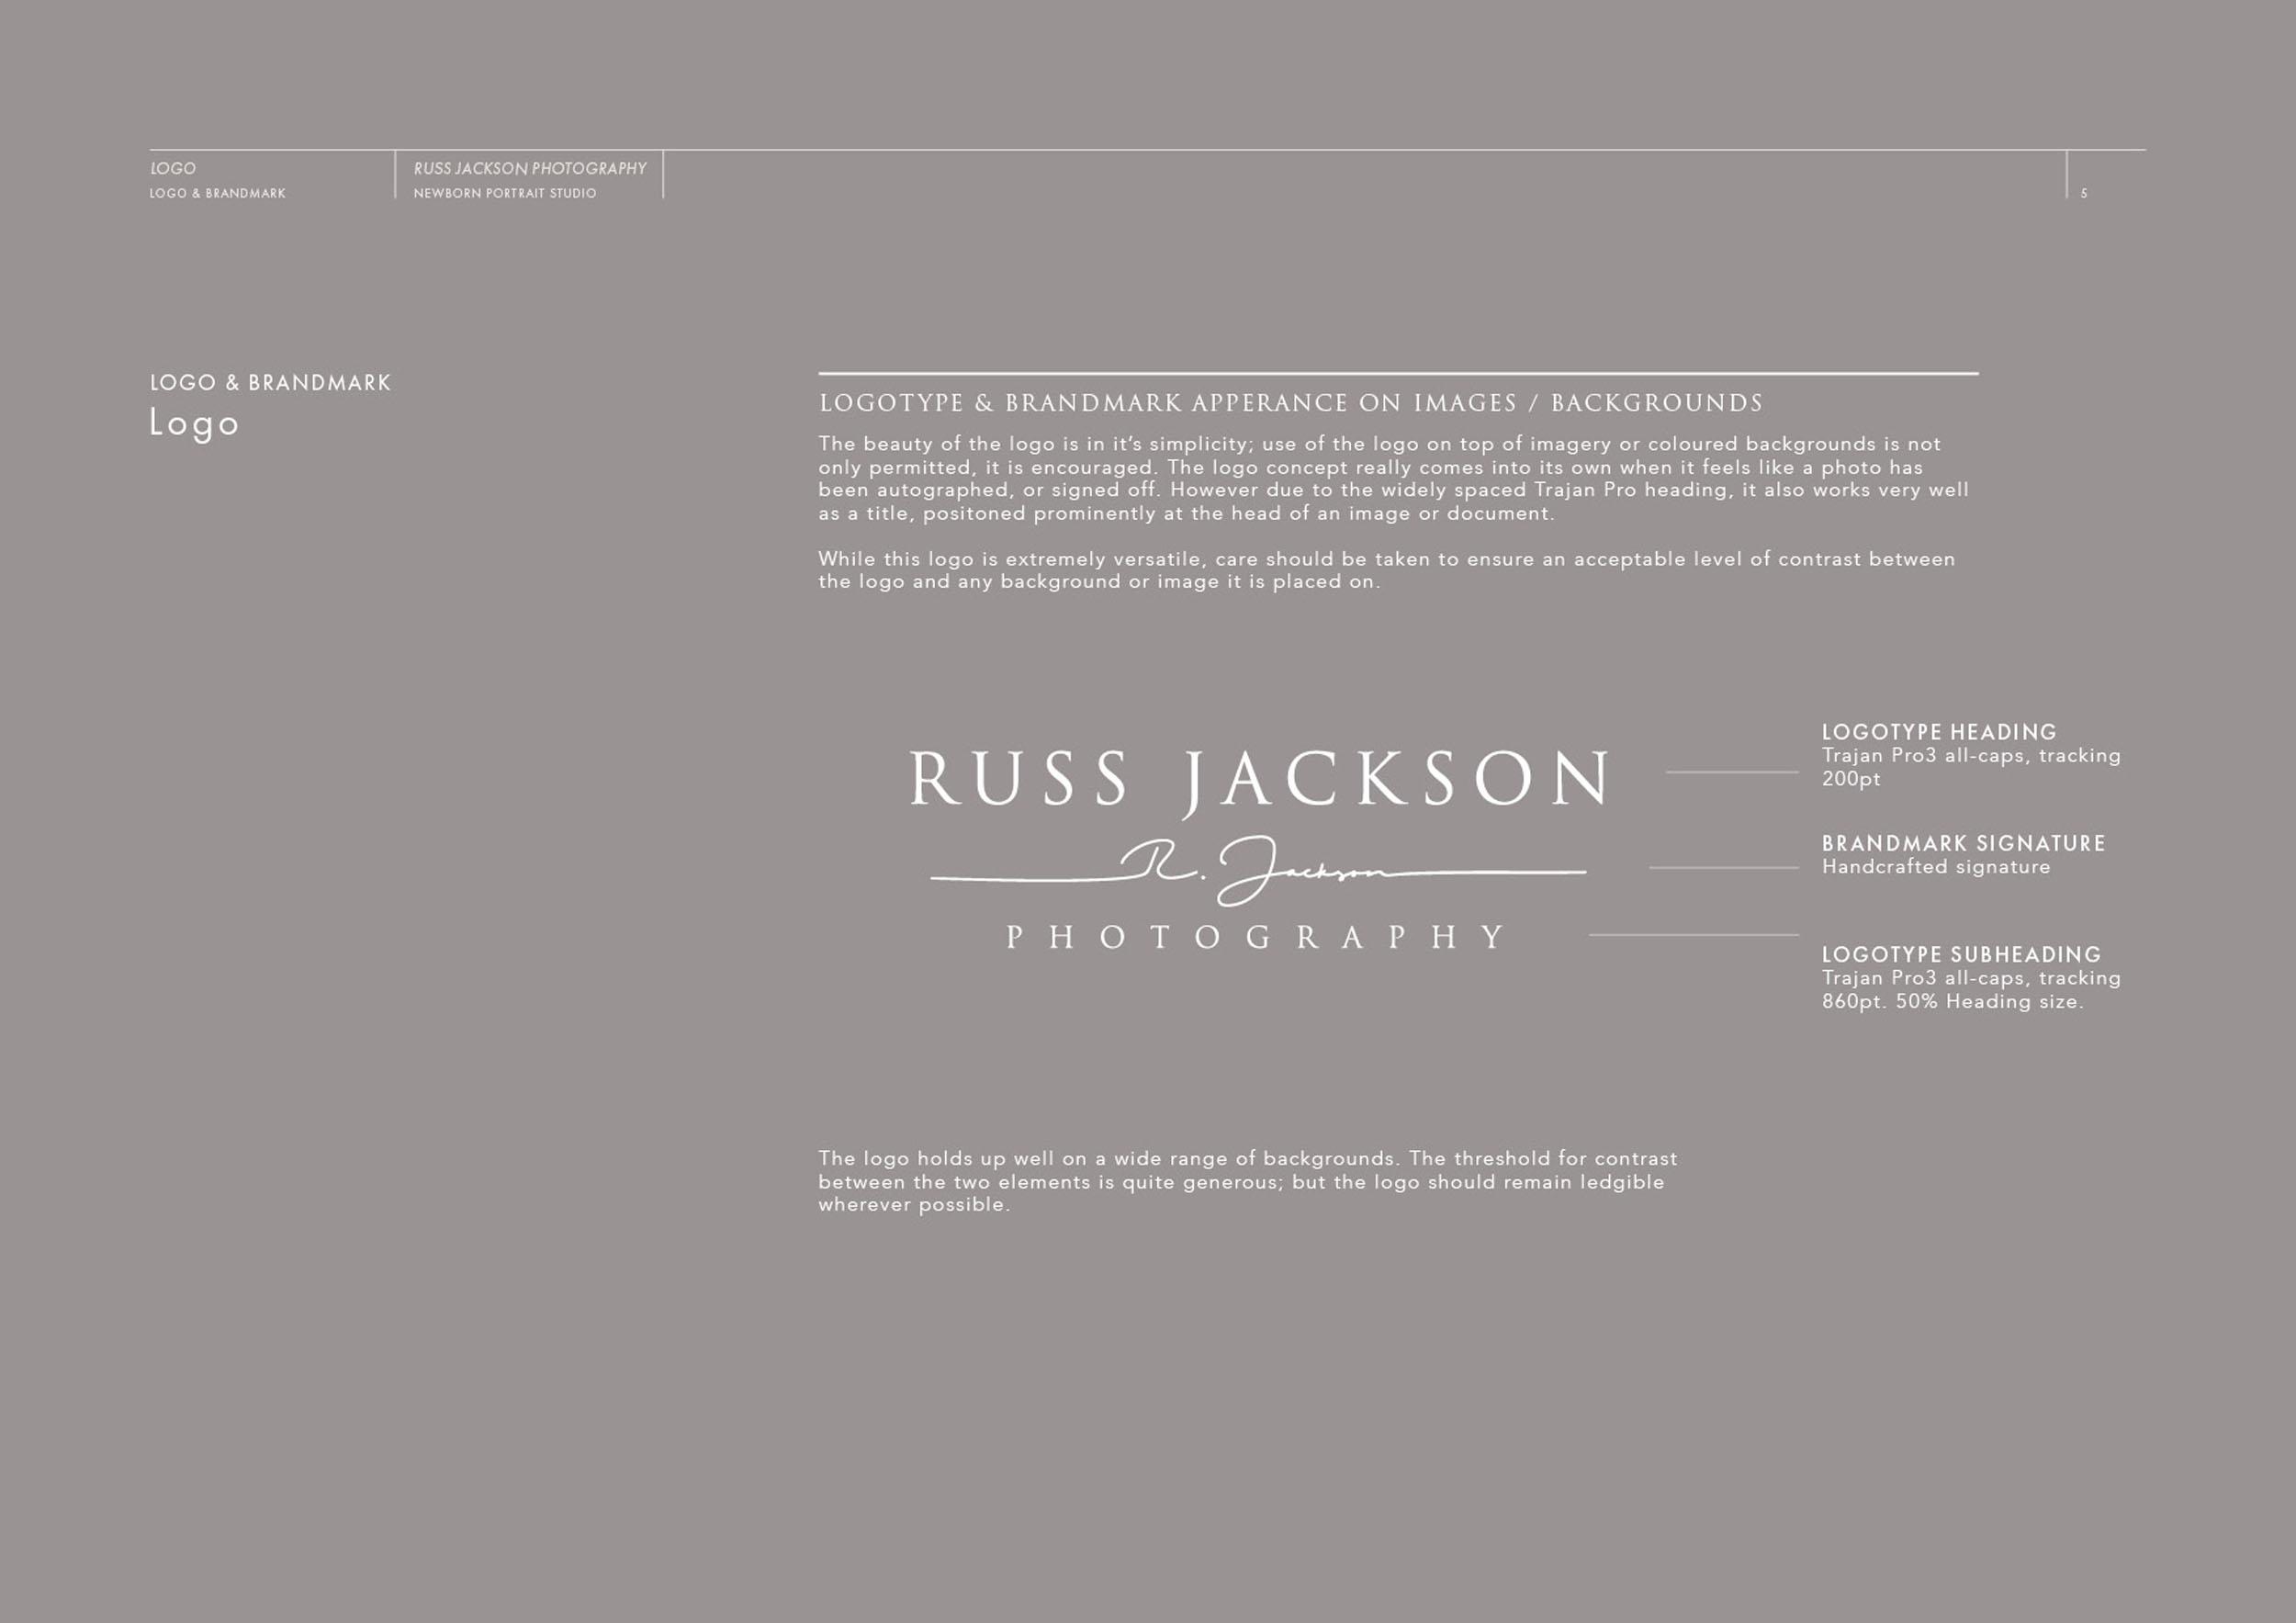 russ-jackson-newborn-photography-branding-05